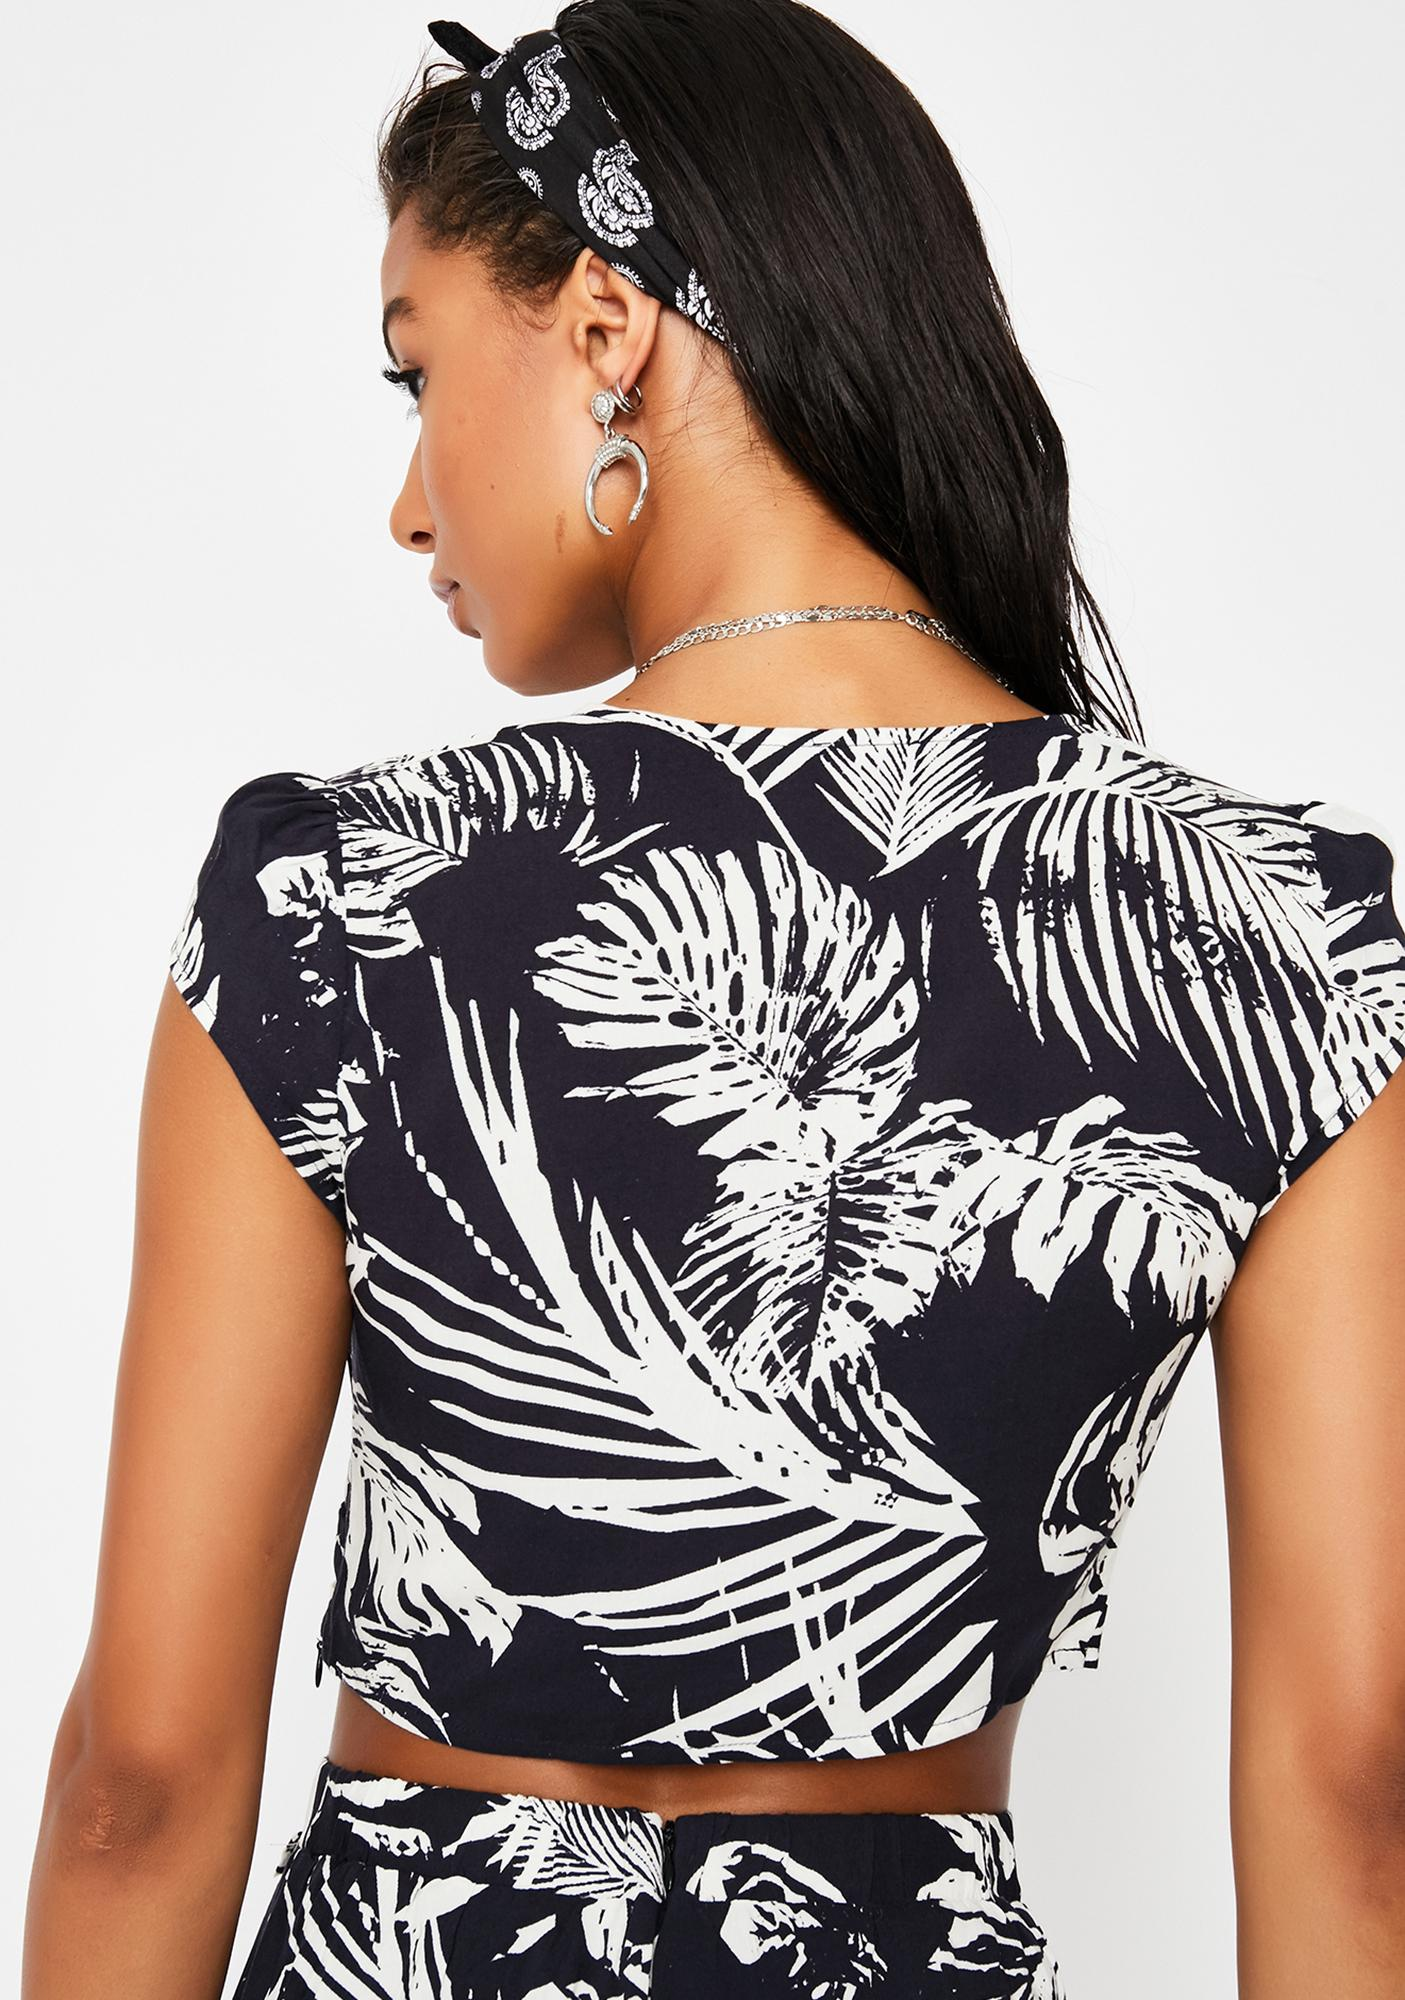 Lira Clothing Athena Crop Top